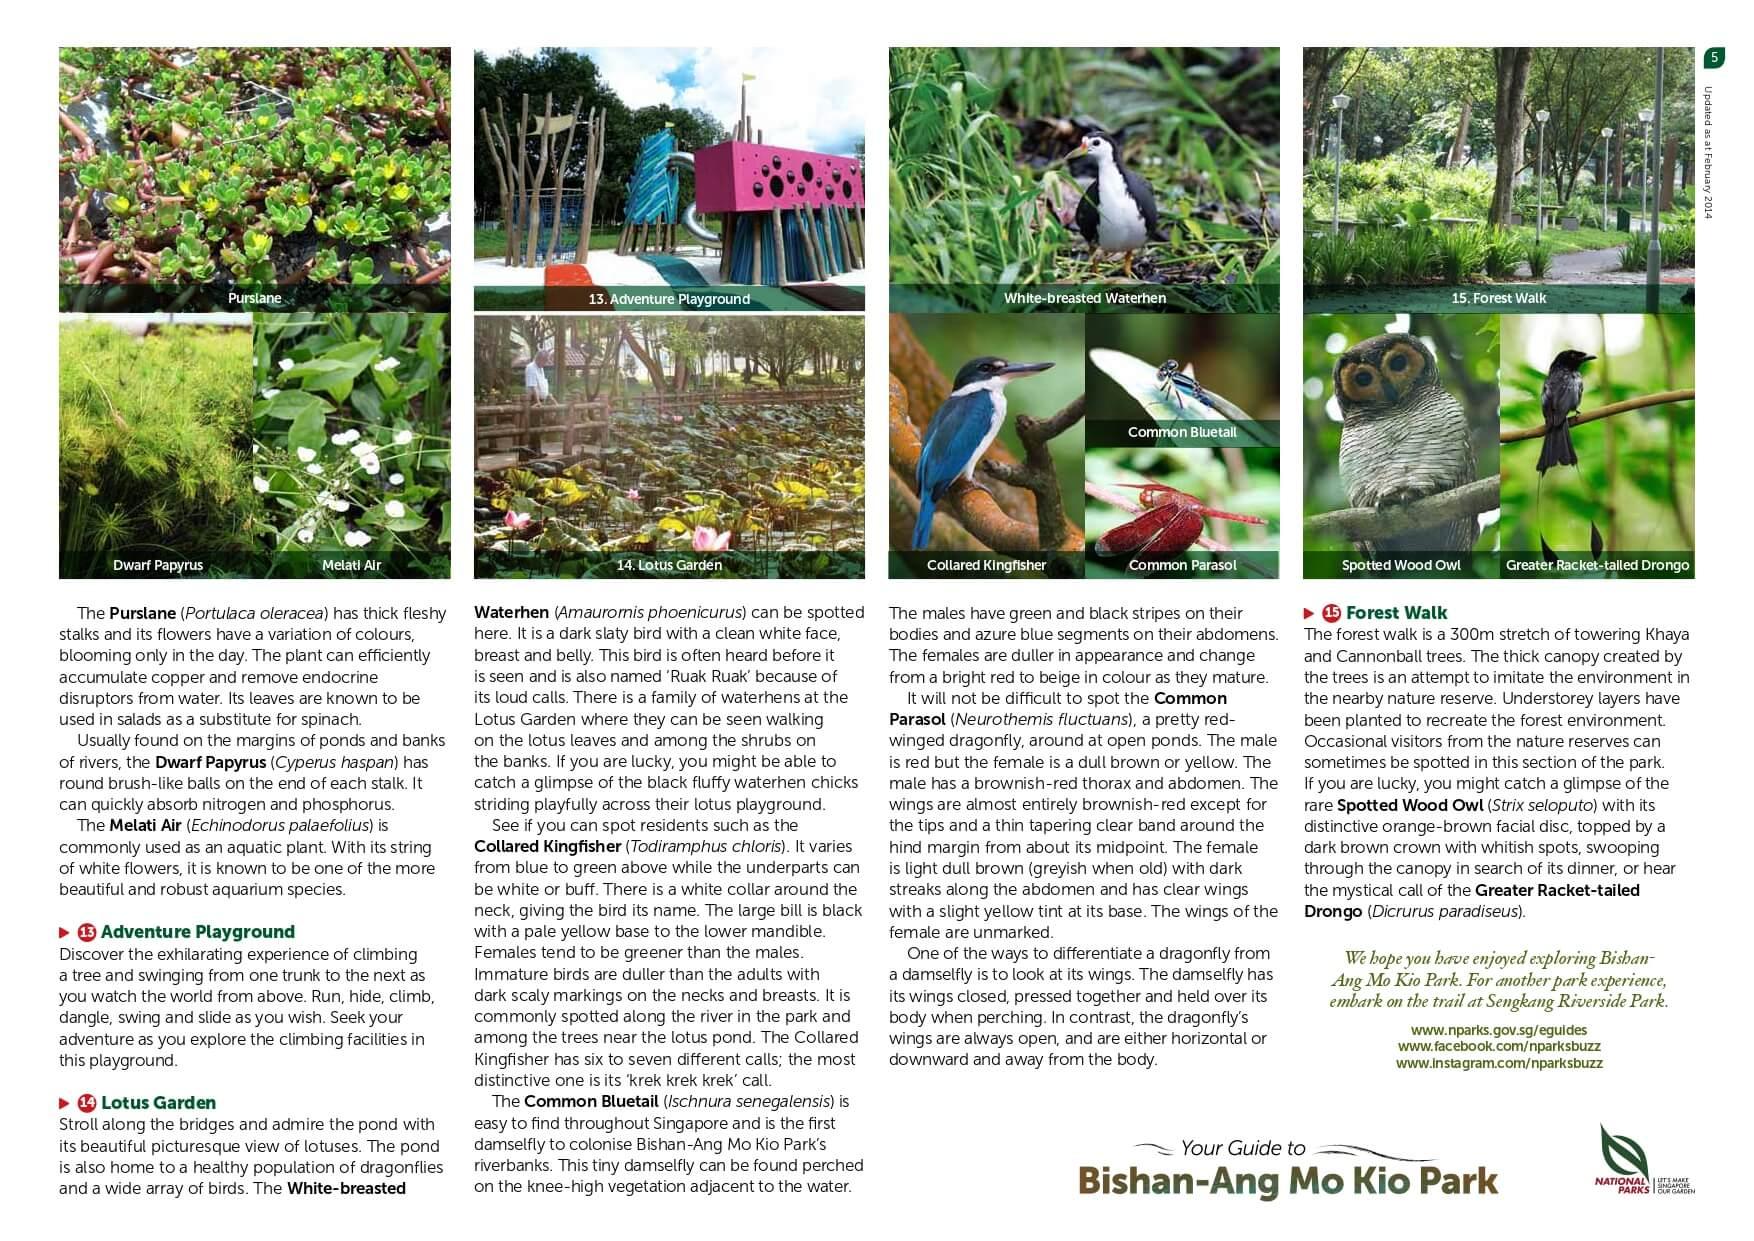 bishan amk park page 5